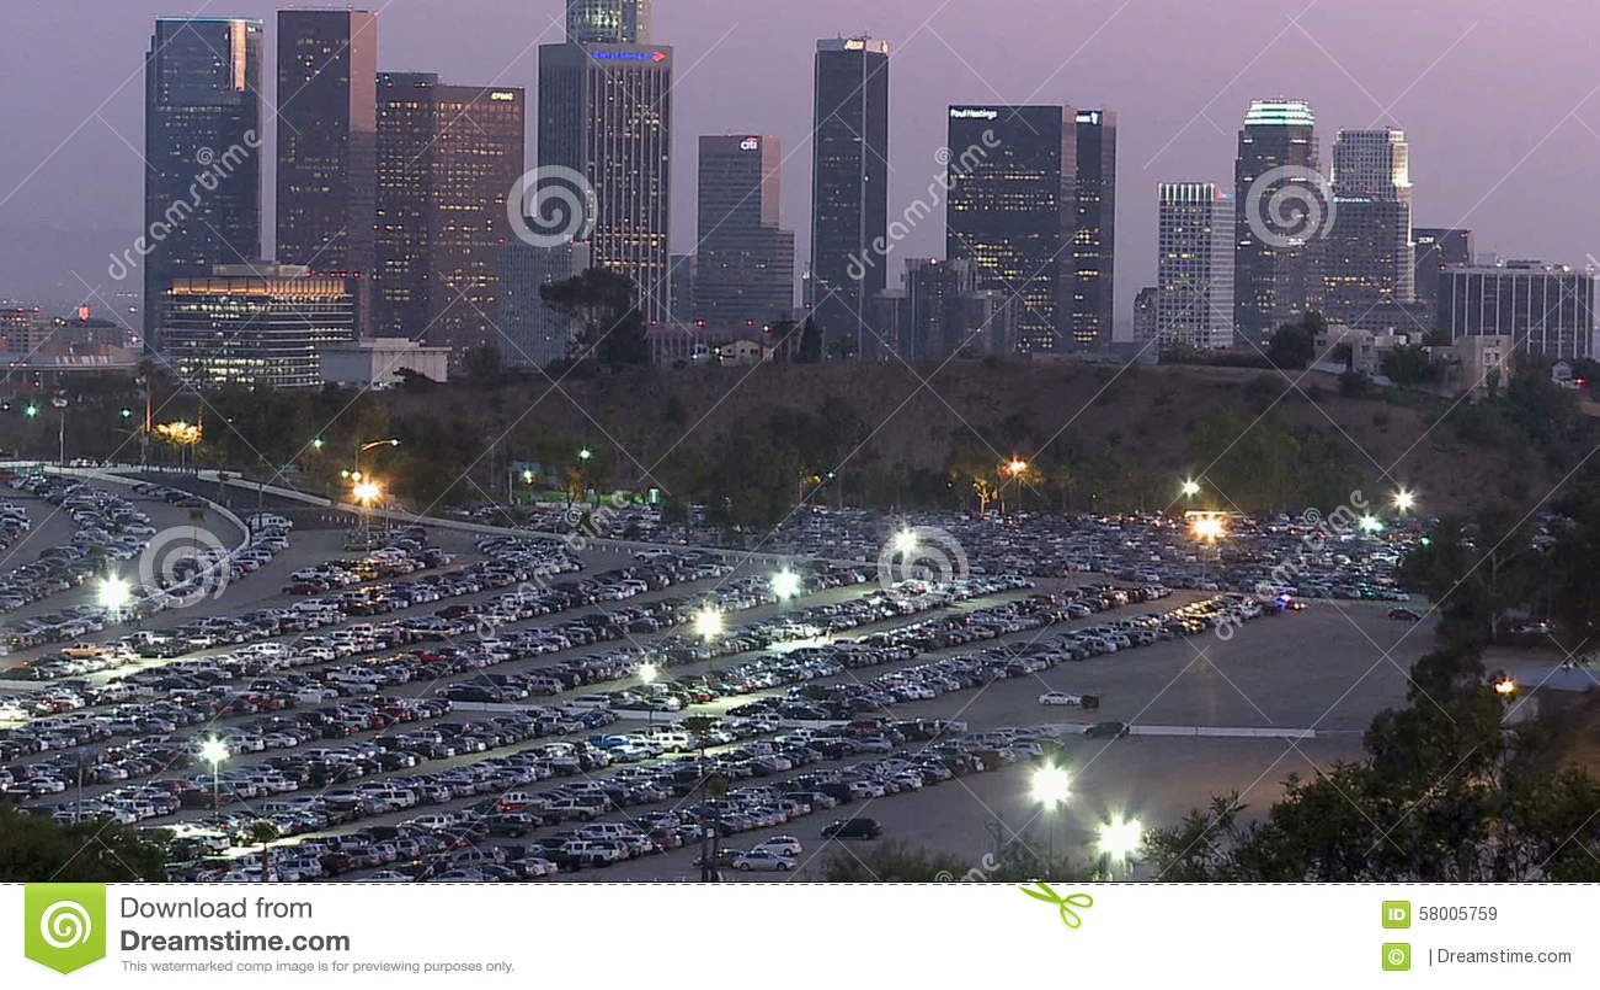 Los Angeles City Skyline With Dodger Stadium Parking Lot